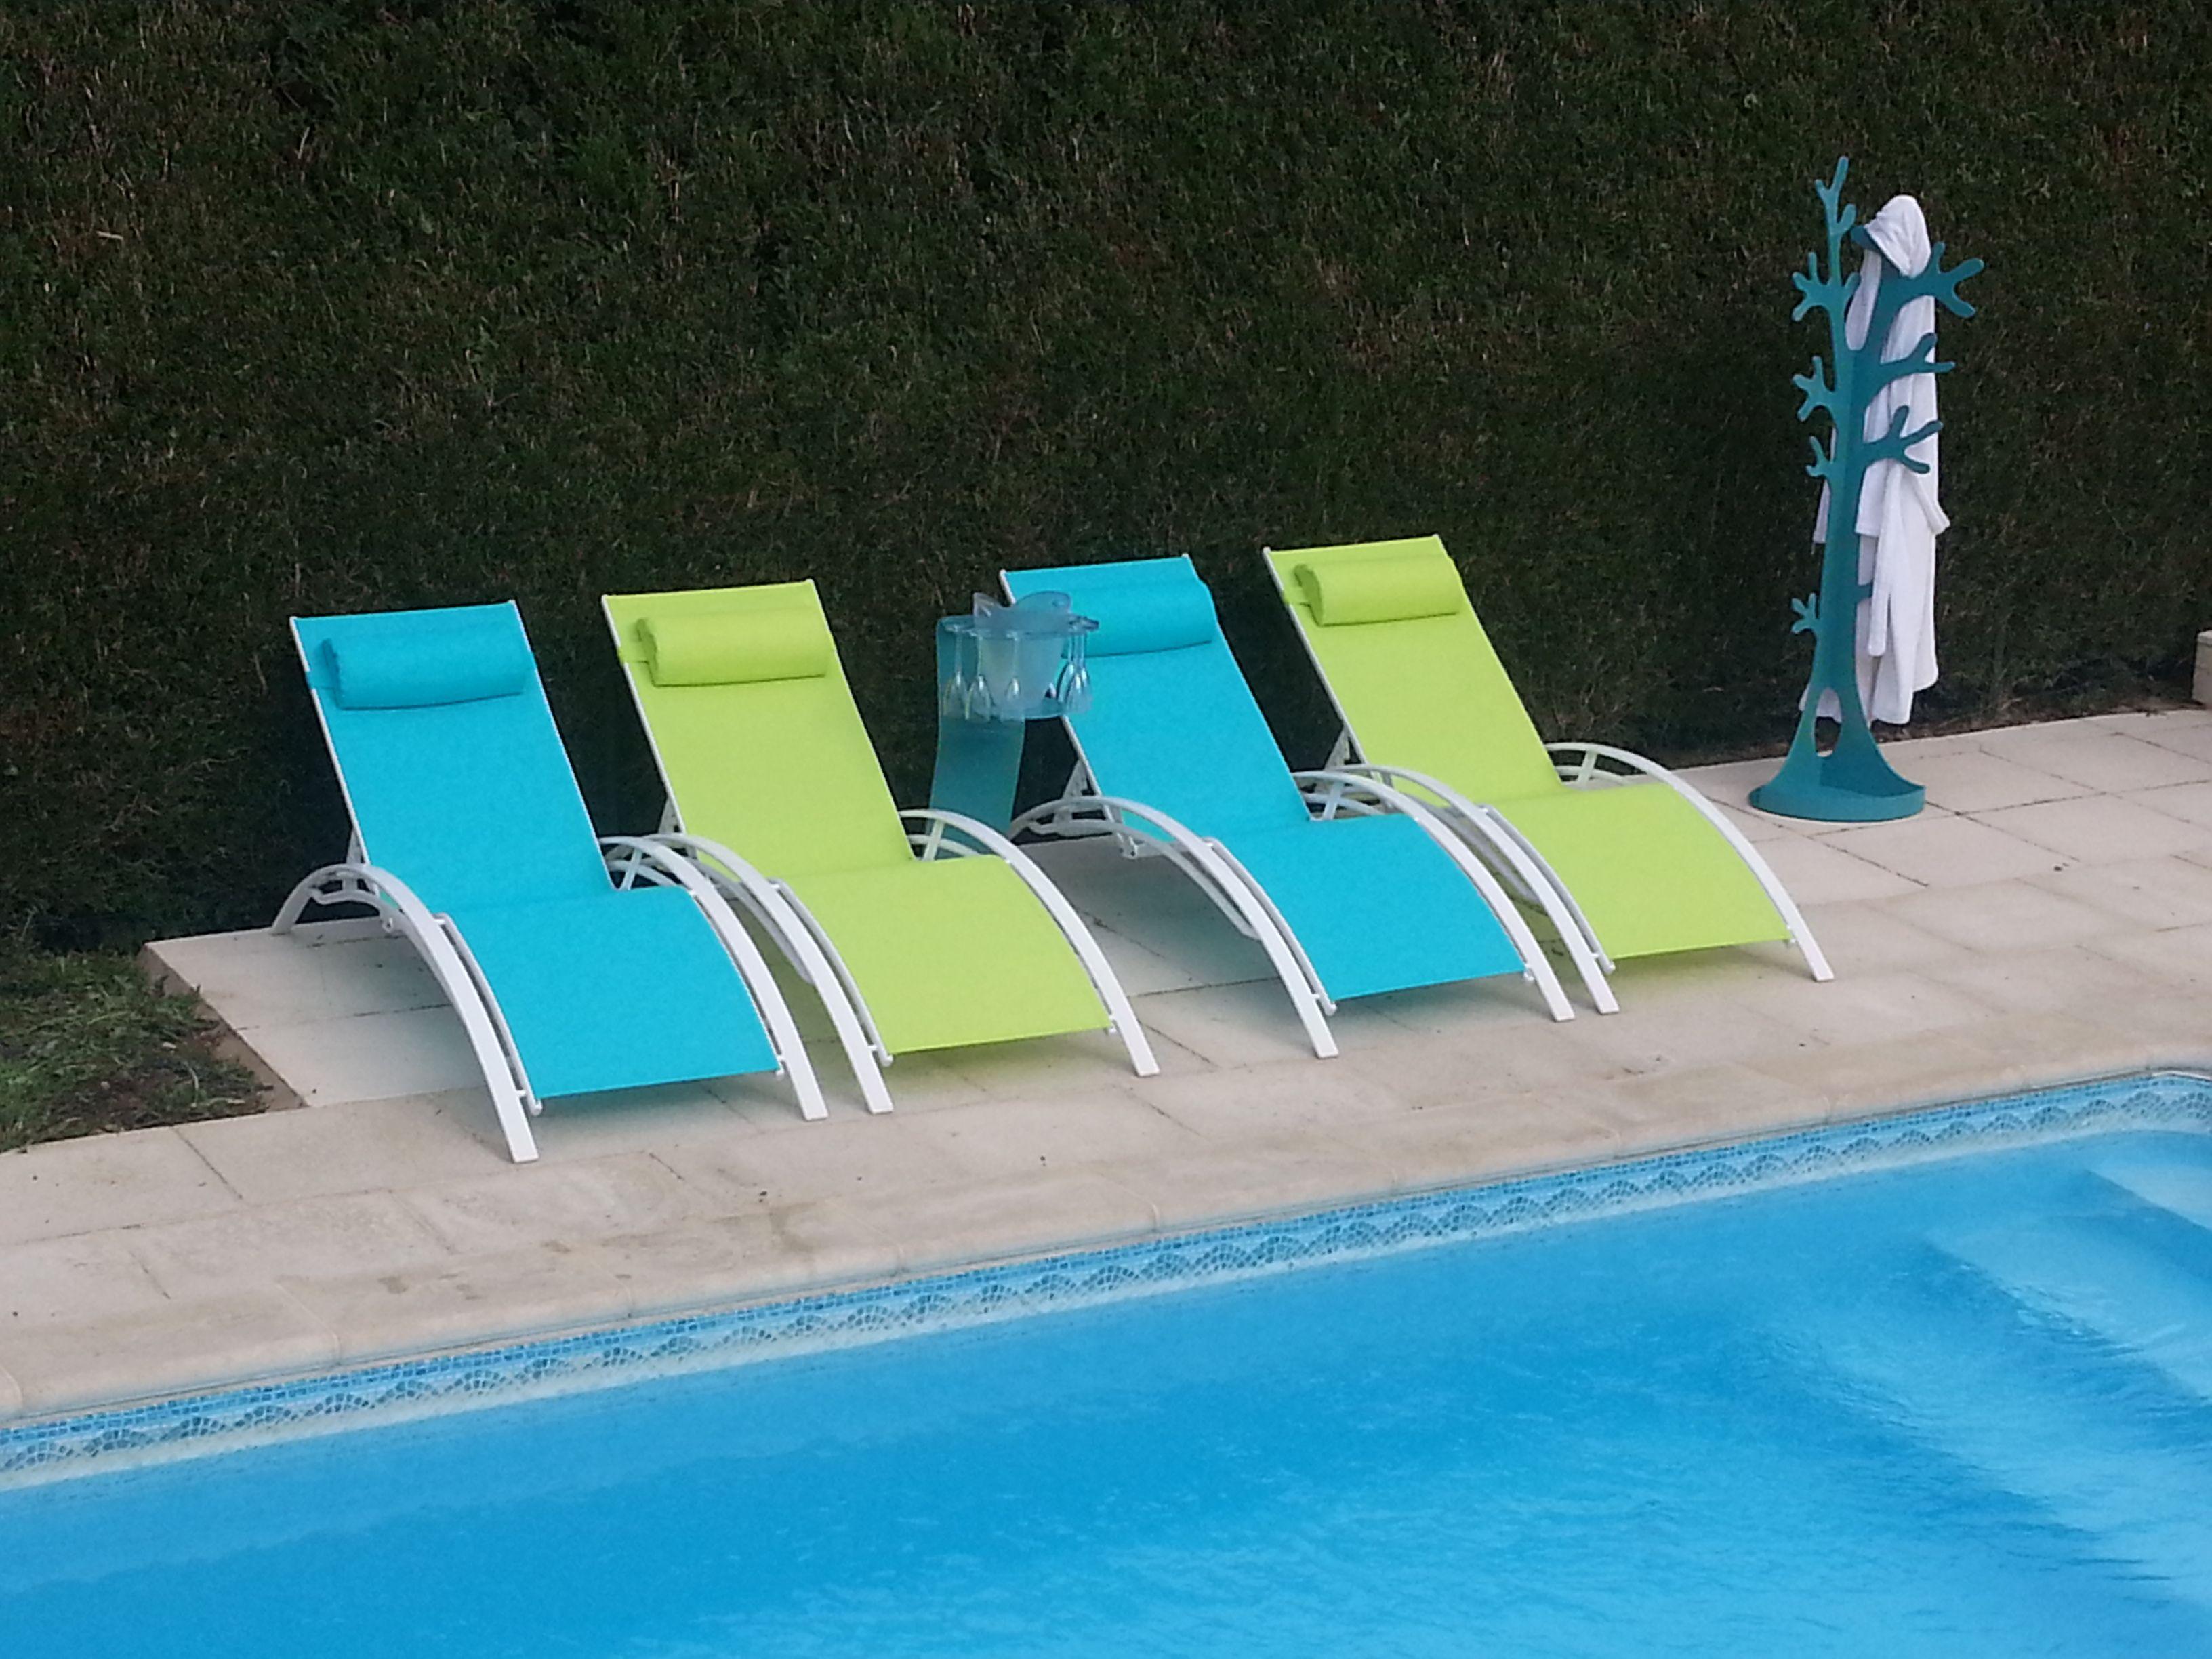 transat piscine interesting transat aluminium porto vecchio bain de soleil transat fauteuil. Black Bedroom Furniture Sets. Home Design Ideas